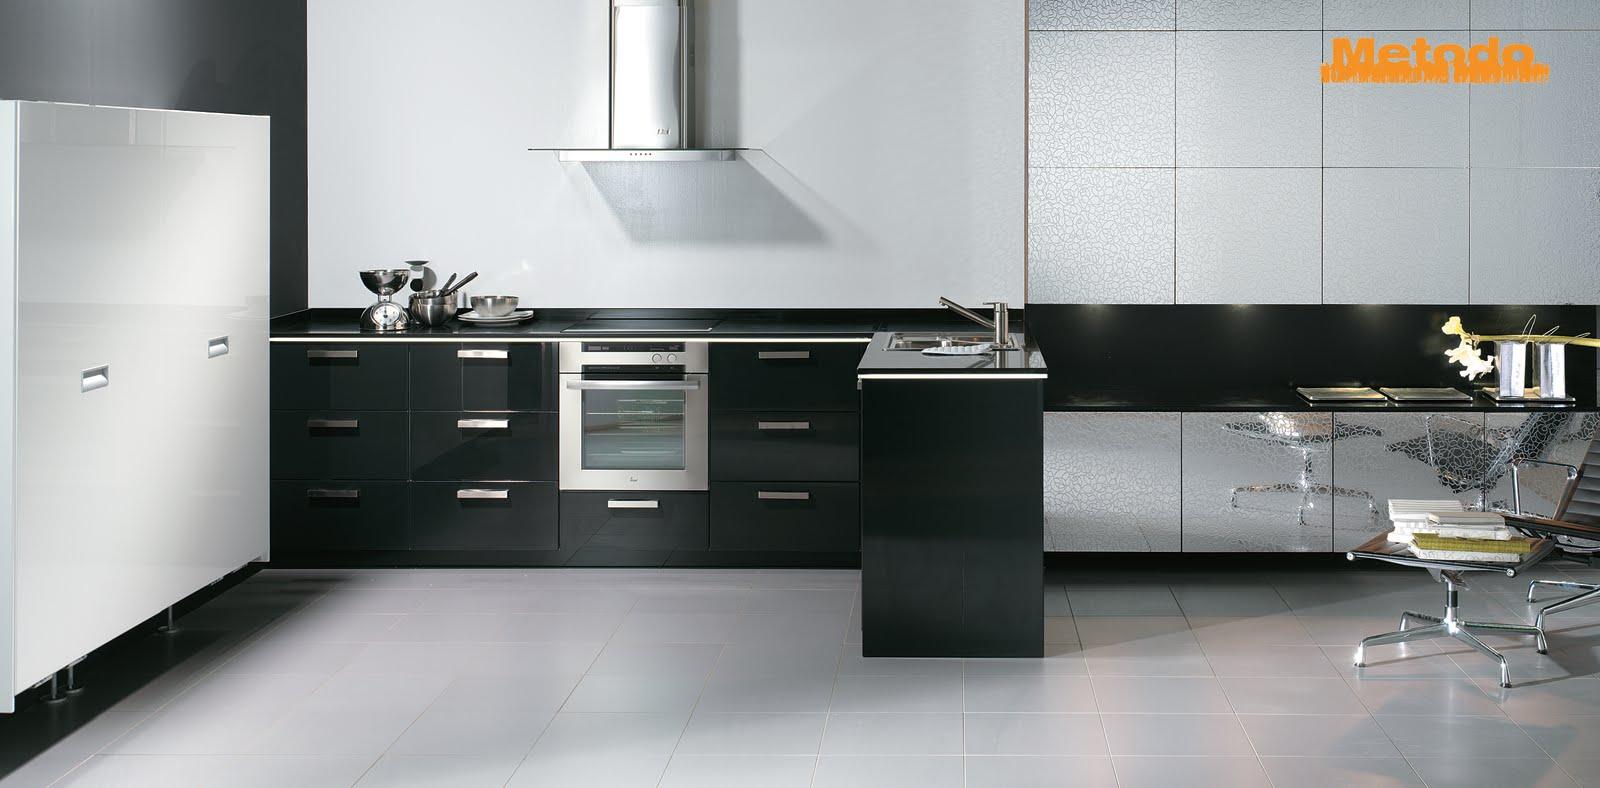 Muebles cocina j salguero 20170817065203 for Mobiliario para cocina